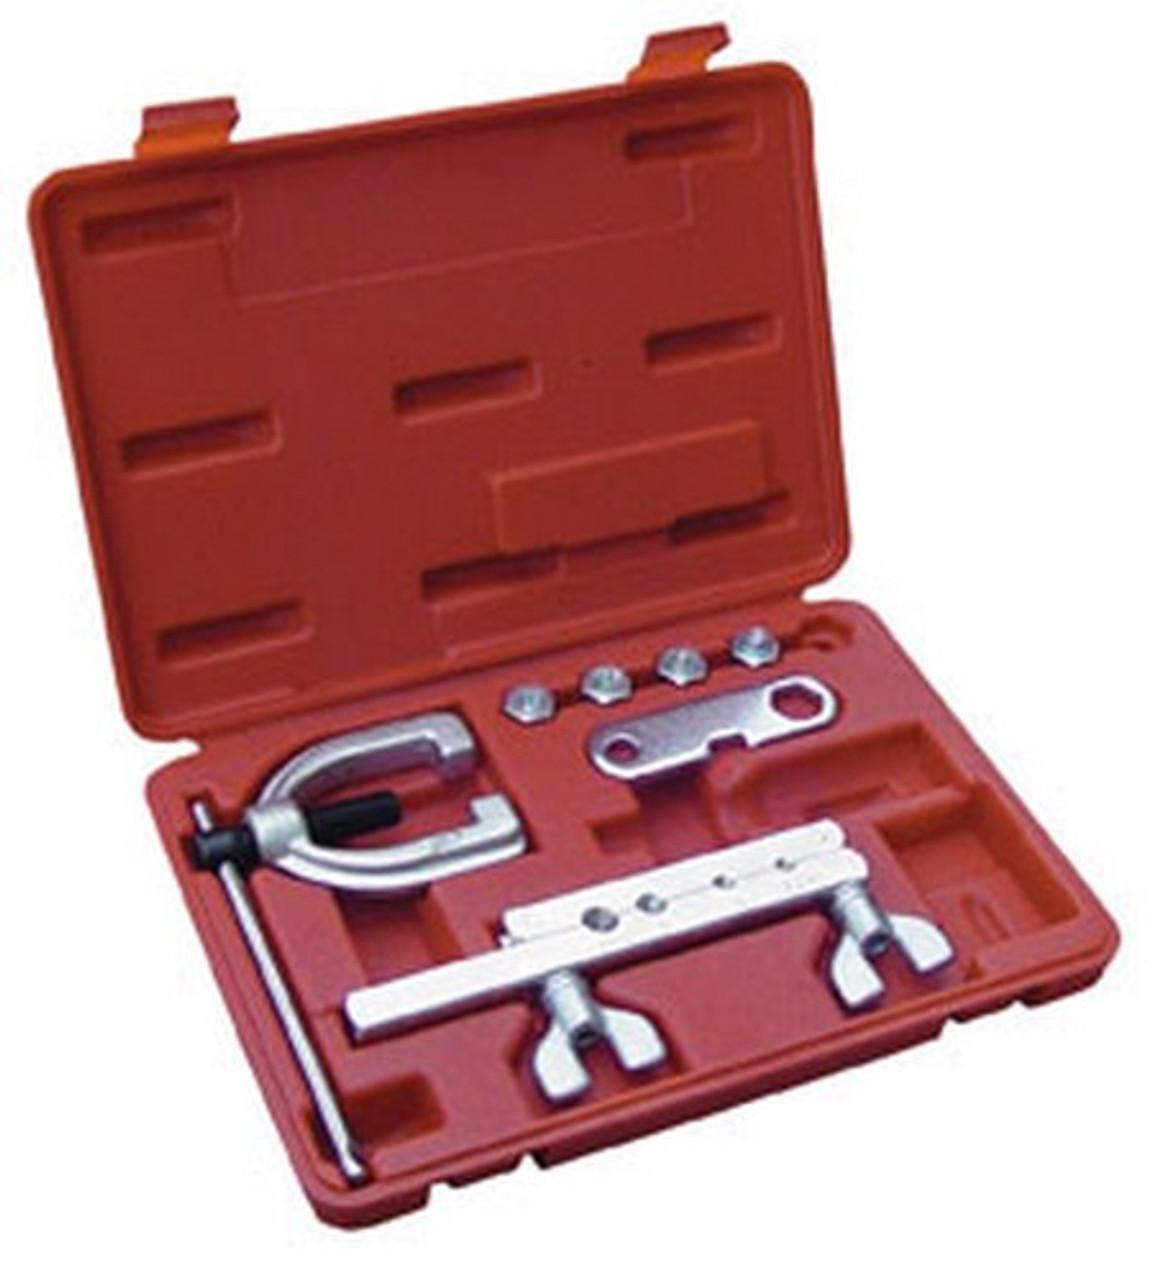 ATD Tools 5479 4-in-1 Tubing Bender